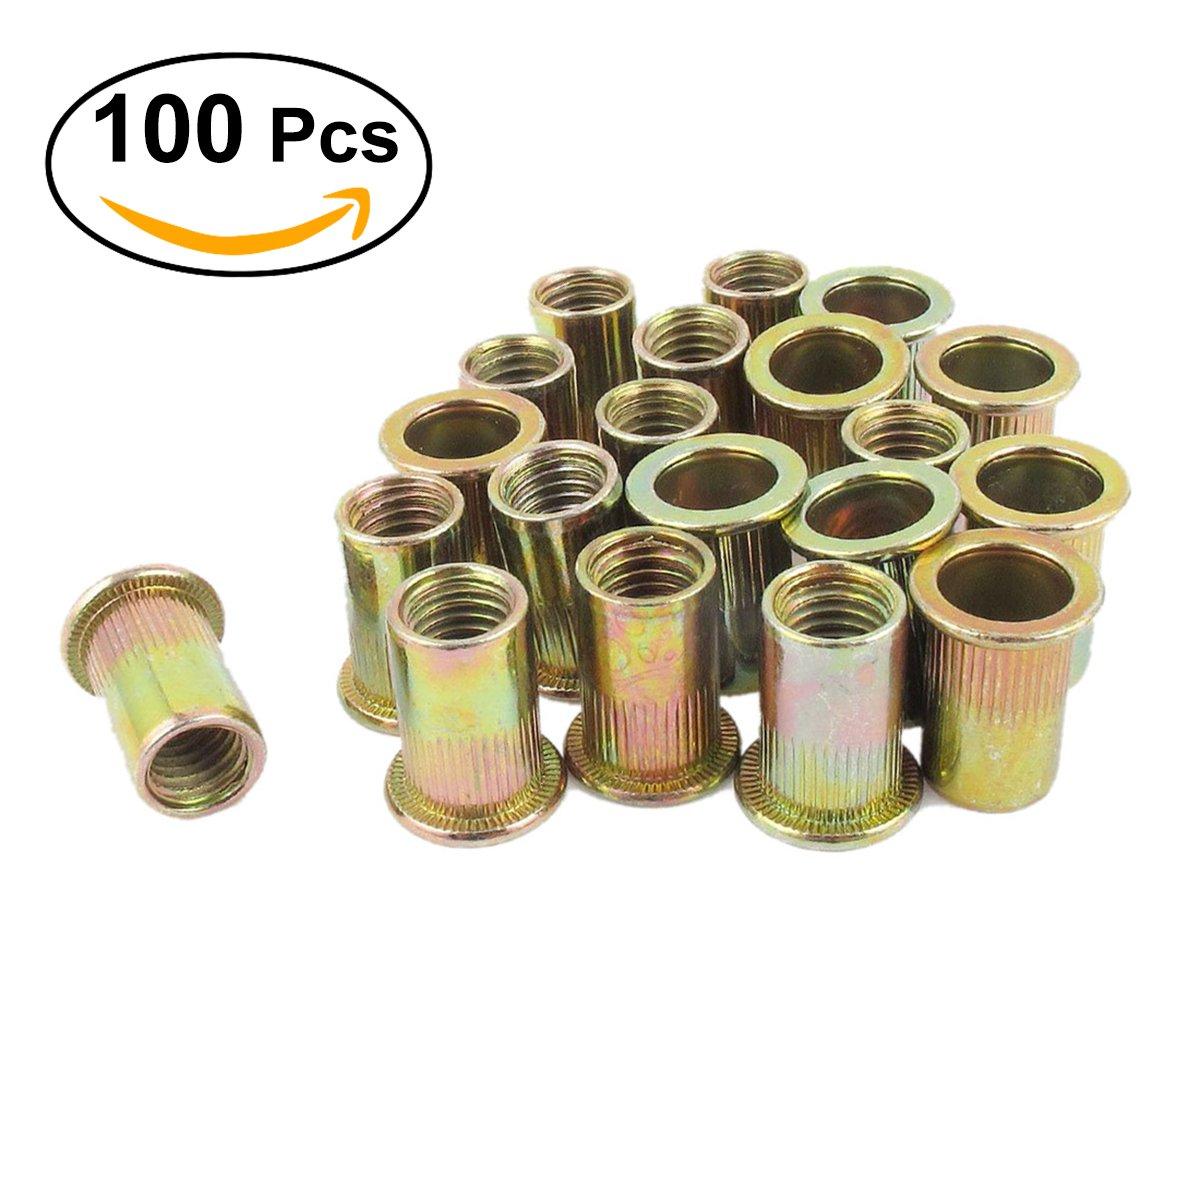 UEETEK 100 Stü ck Stahl Nietmuttern Sortiment verzinkt Nutsert